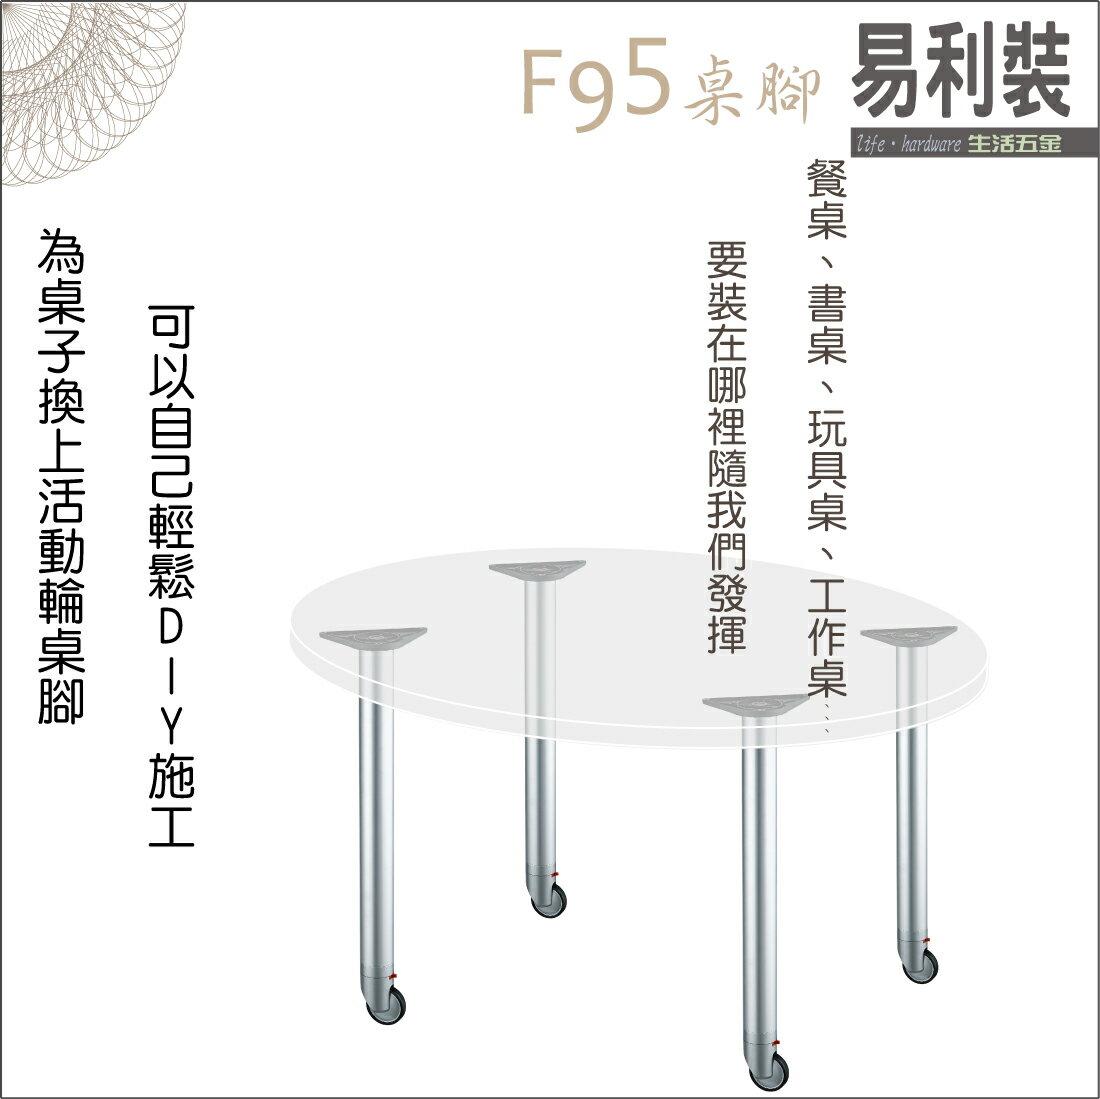 【 EASYCAN  】F95 餐桌腳 易利裝生活五金 書桌腳 玩具桌腳 工作桌腳 房間 臥房 衣櫃 小資族 辦公家具 系統家具 1